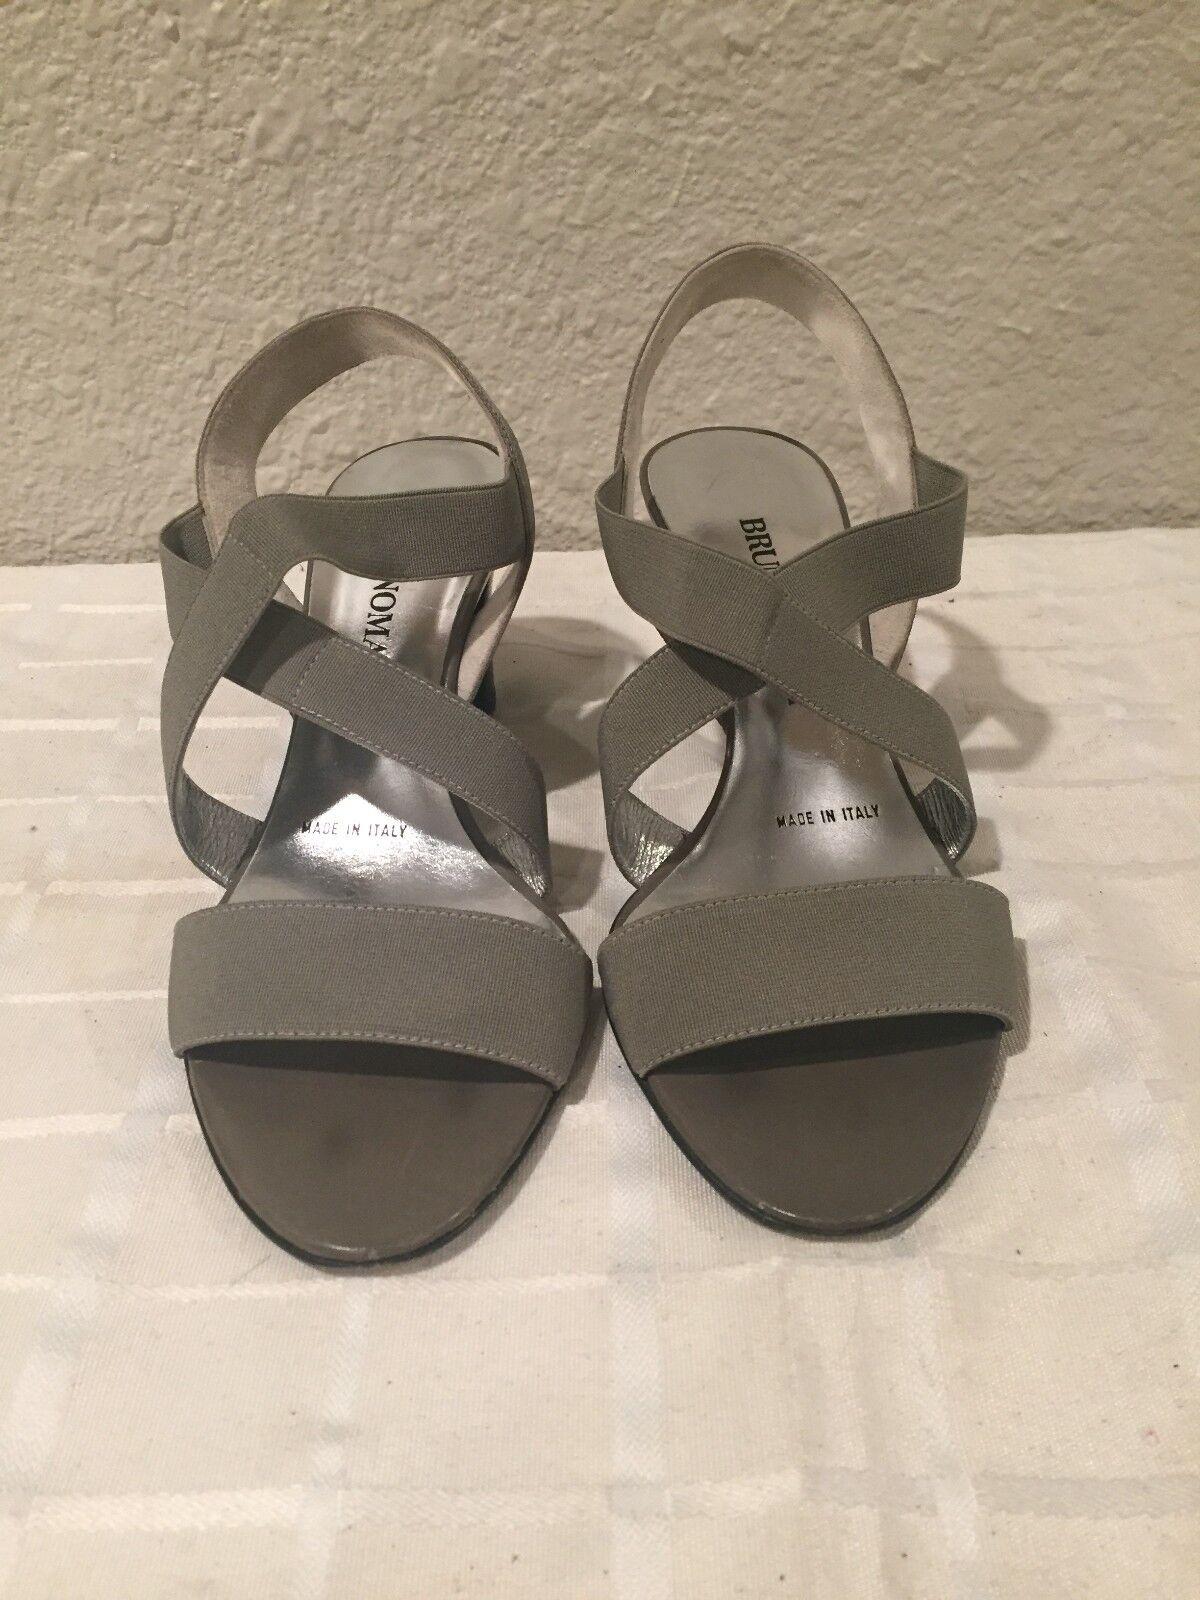 Bruno Magli US Silver Grey Fabric Sandals Heels 35 EU/5 US Magli Made in Italy 459e64